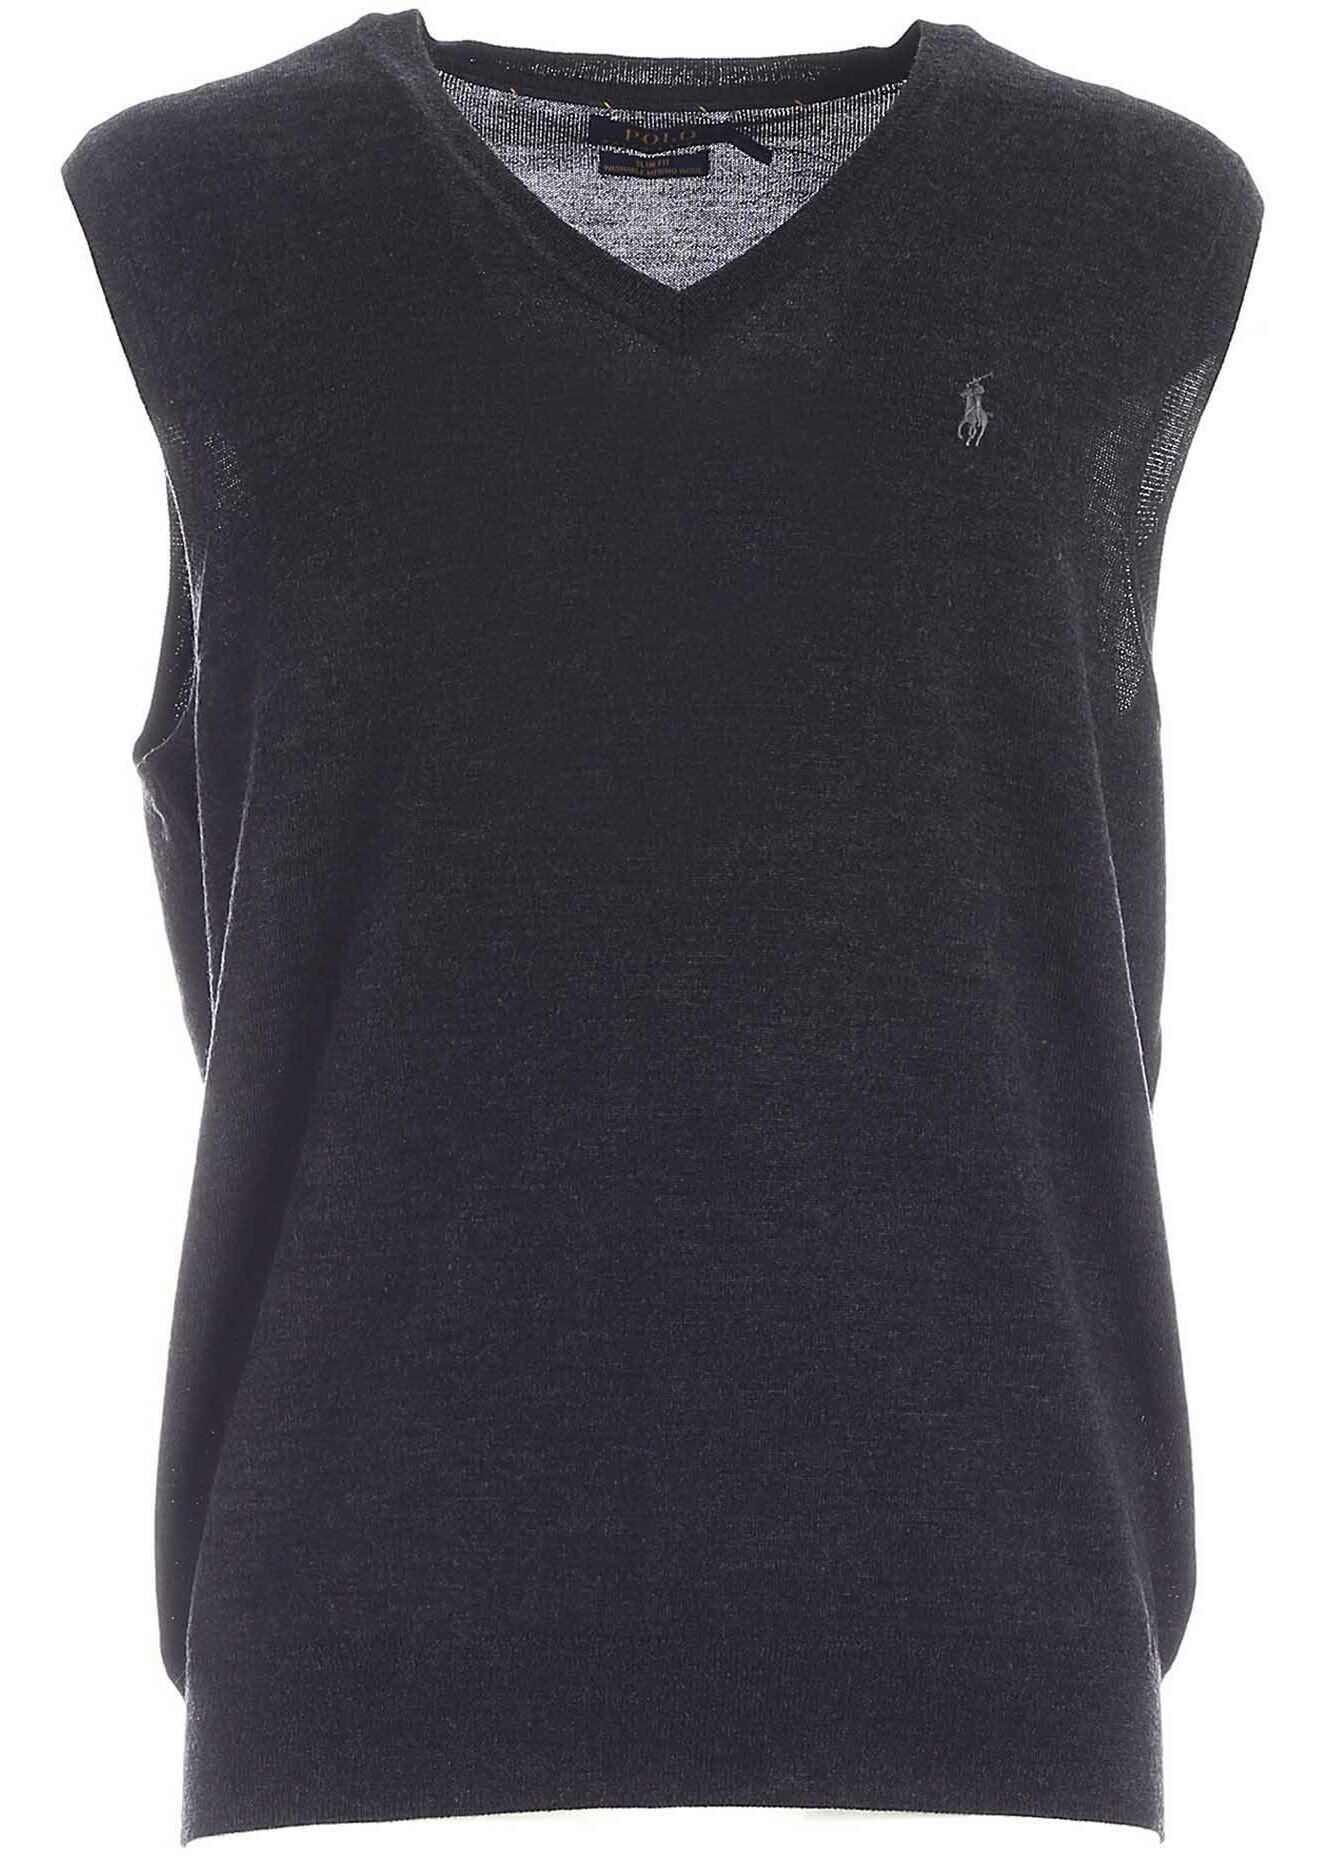 Ralph Lauren Logo Embroidery Knitted Vest In Dark Grey Grey imagine